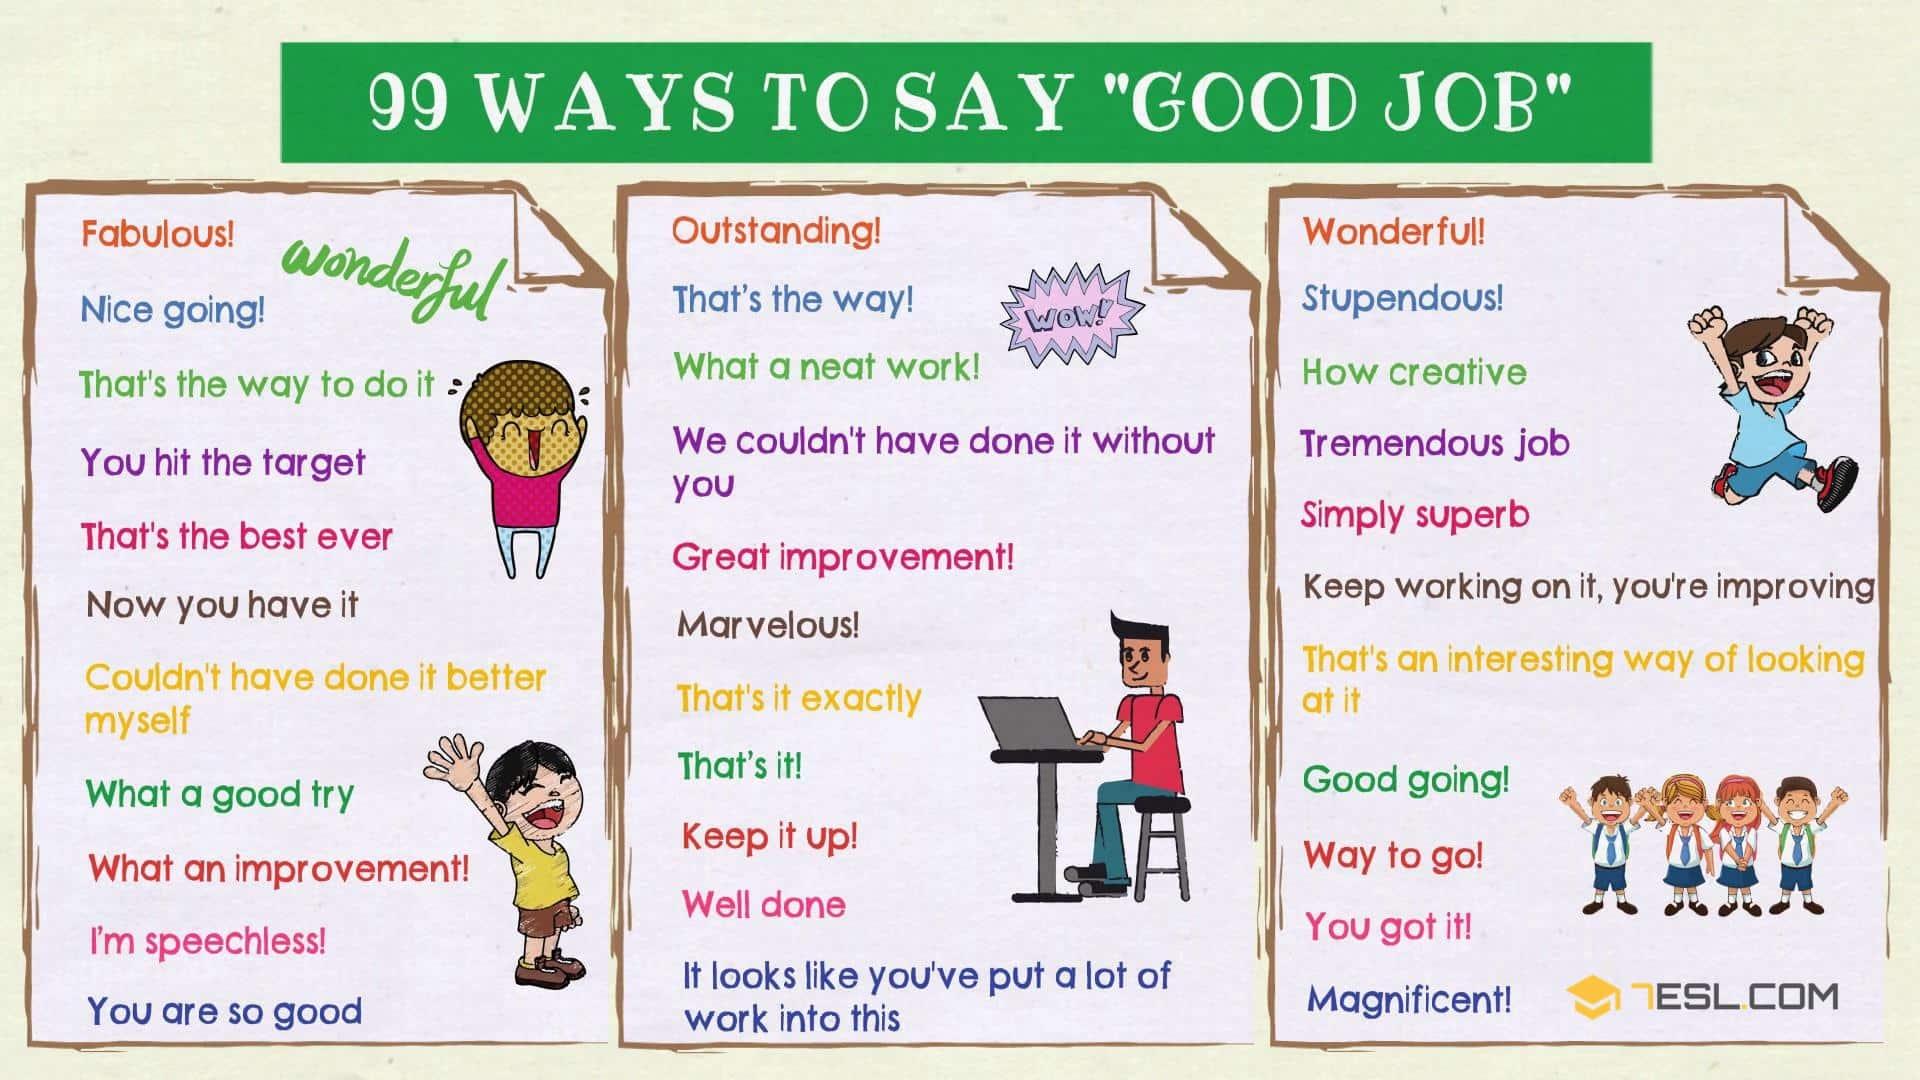 Good Job Synonym 99 Ways To Say Good Job In English